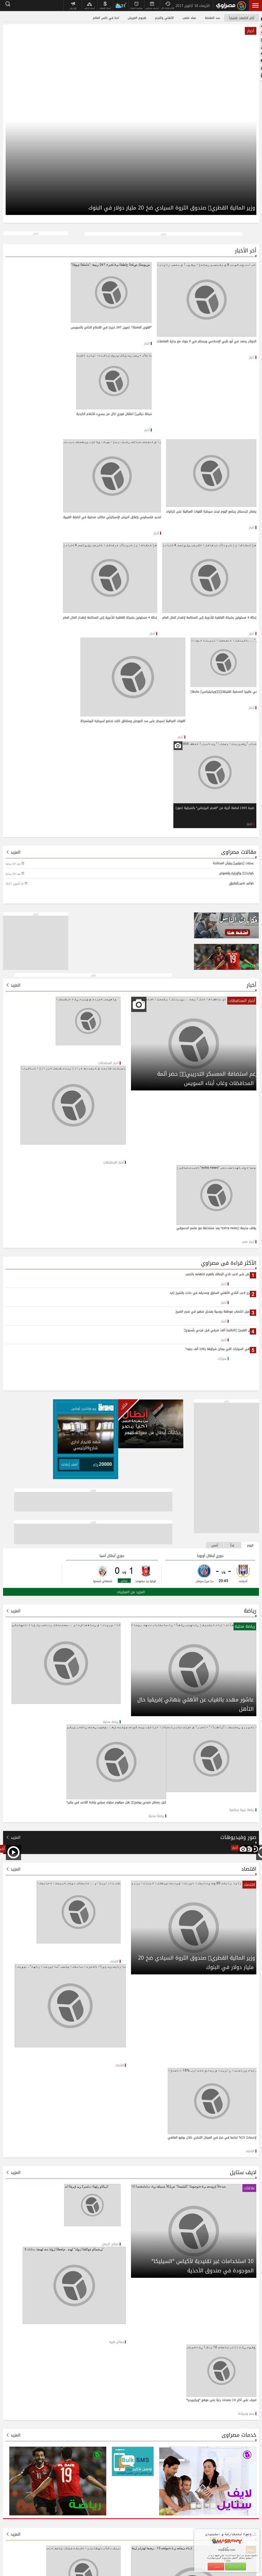 Masrawy at Wednesday Oct. 18, 2017, 12:09 p.m. UTC